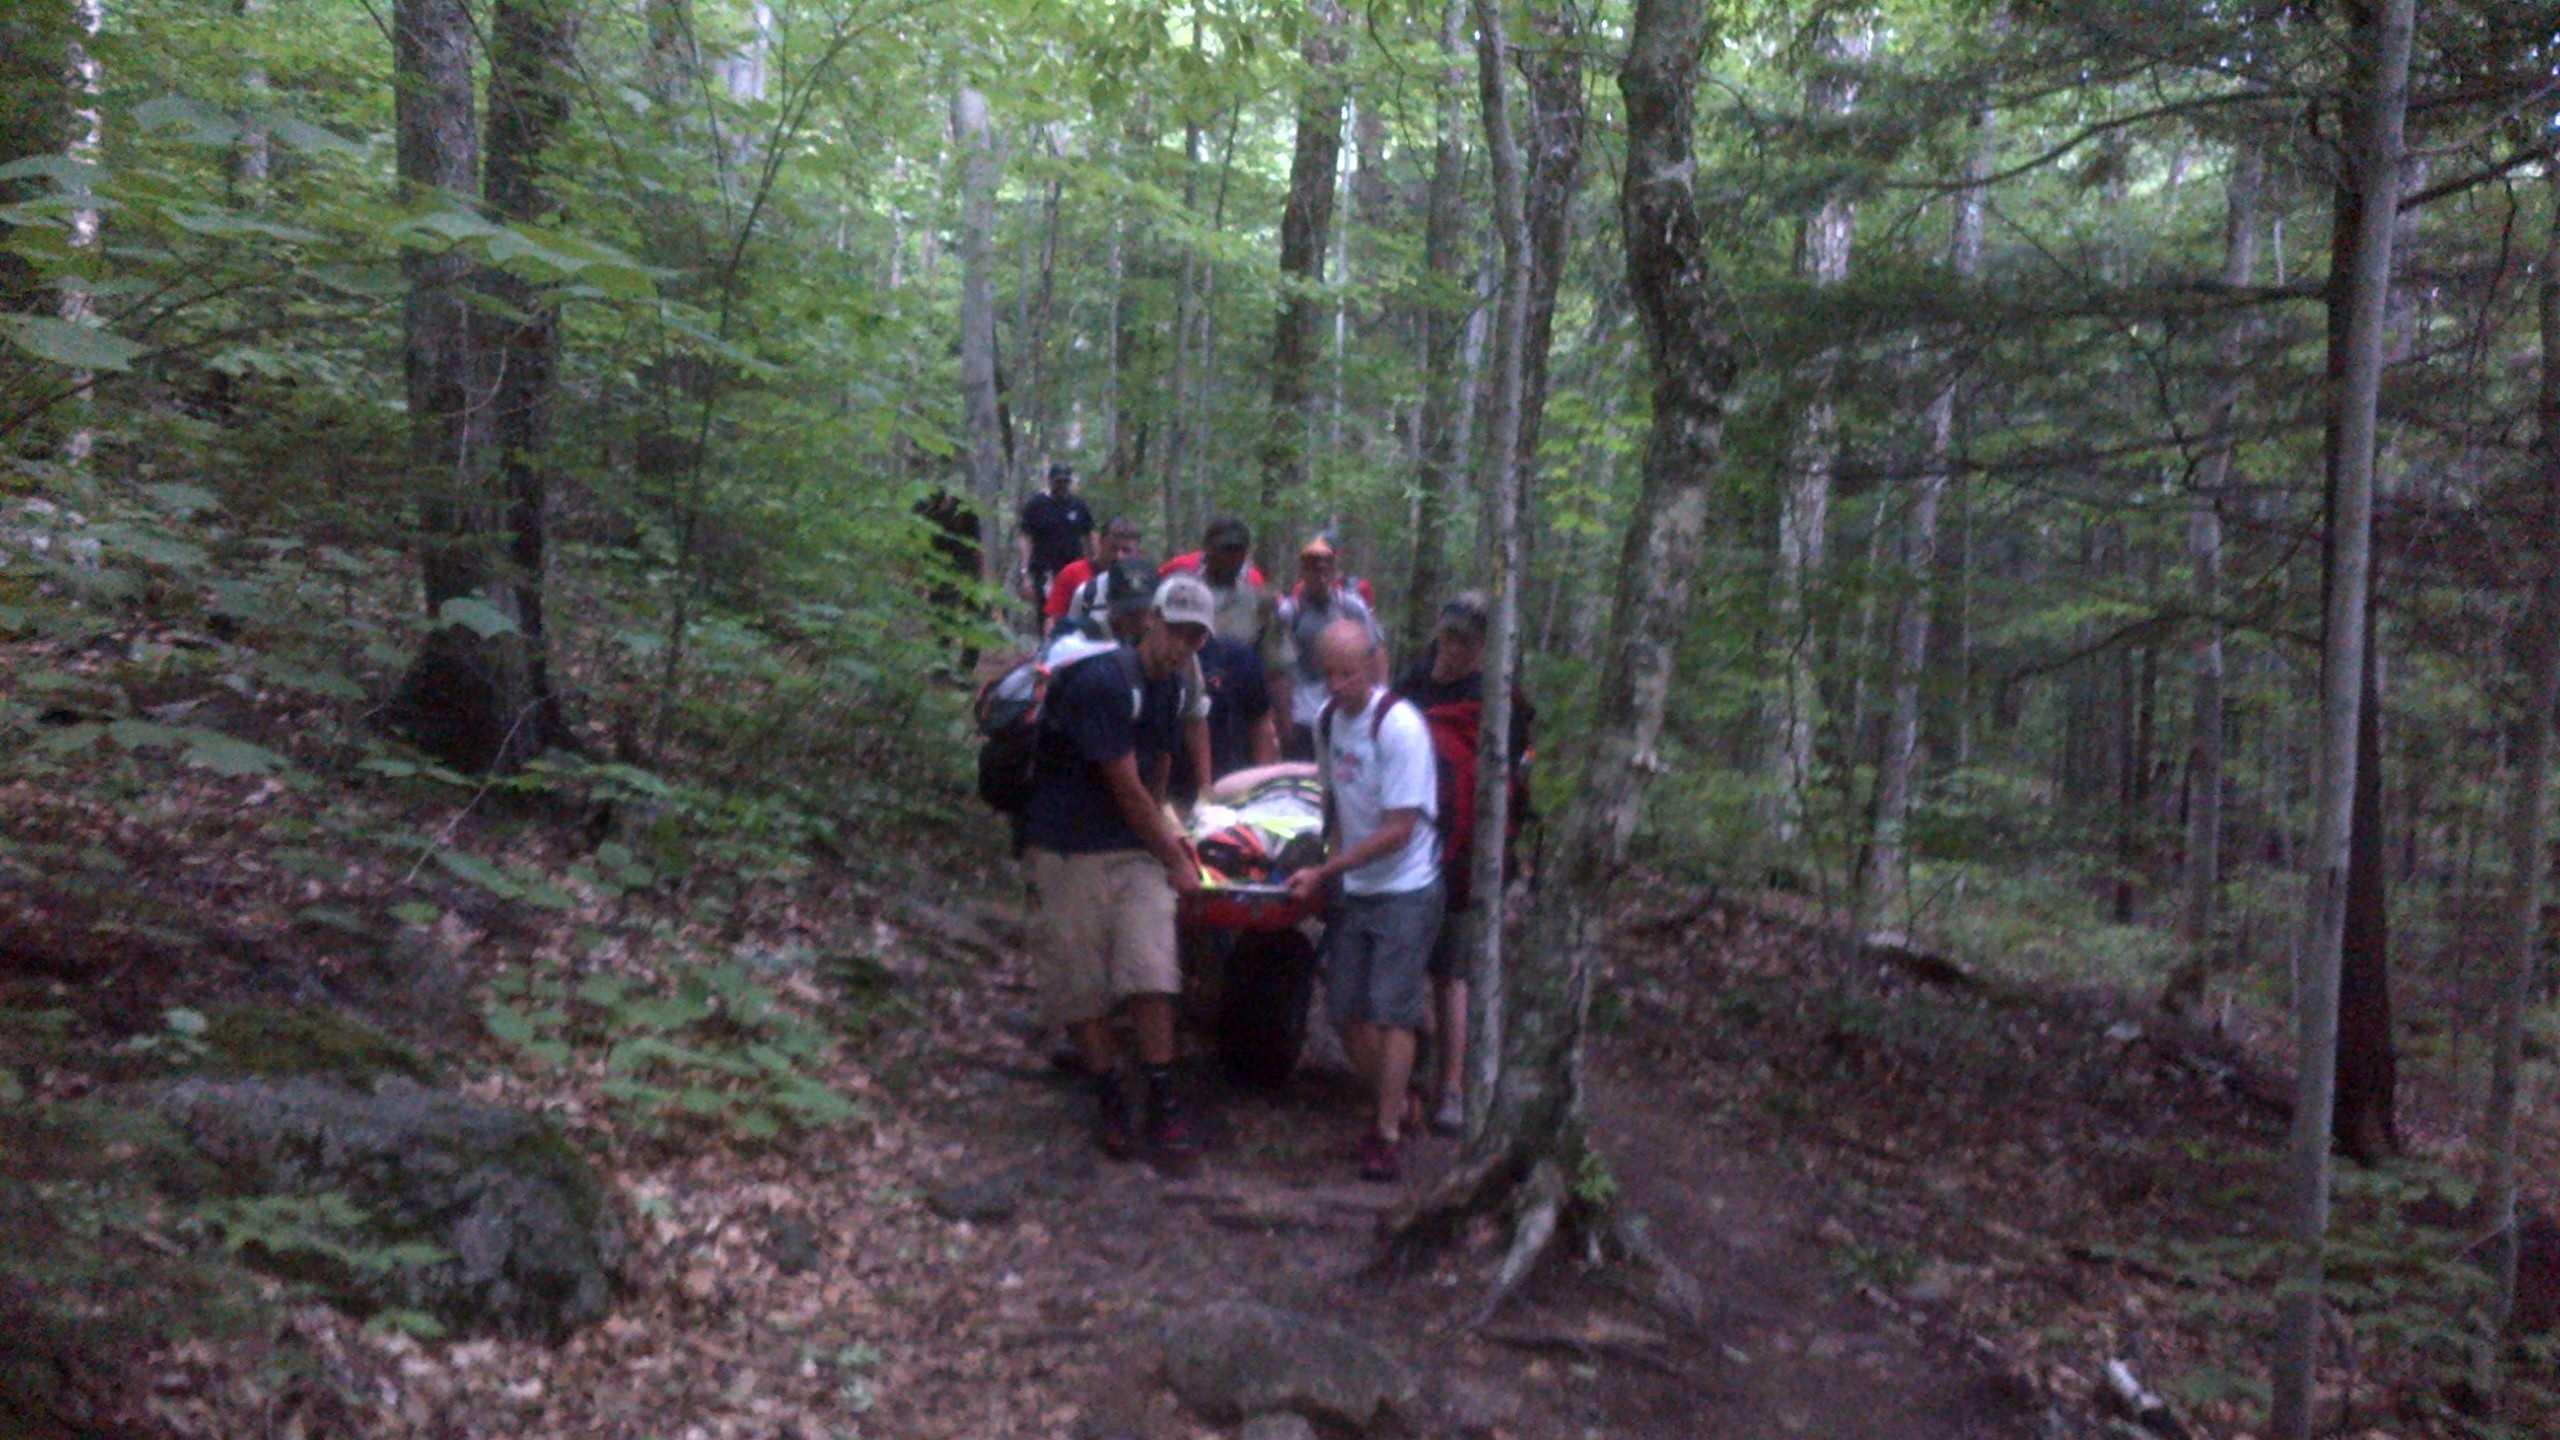 Img: Injured Hiker Rescued